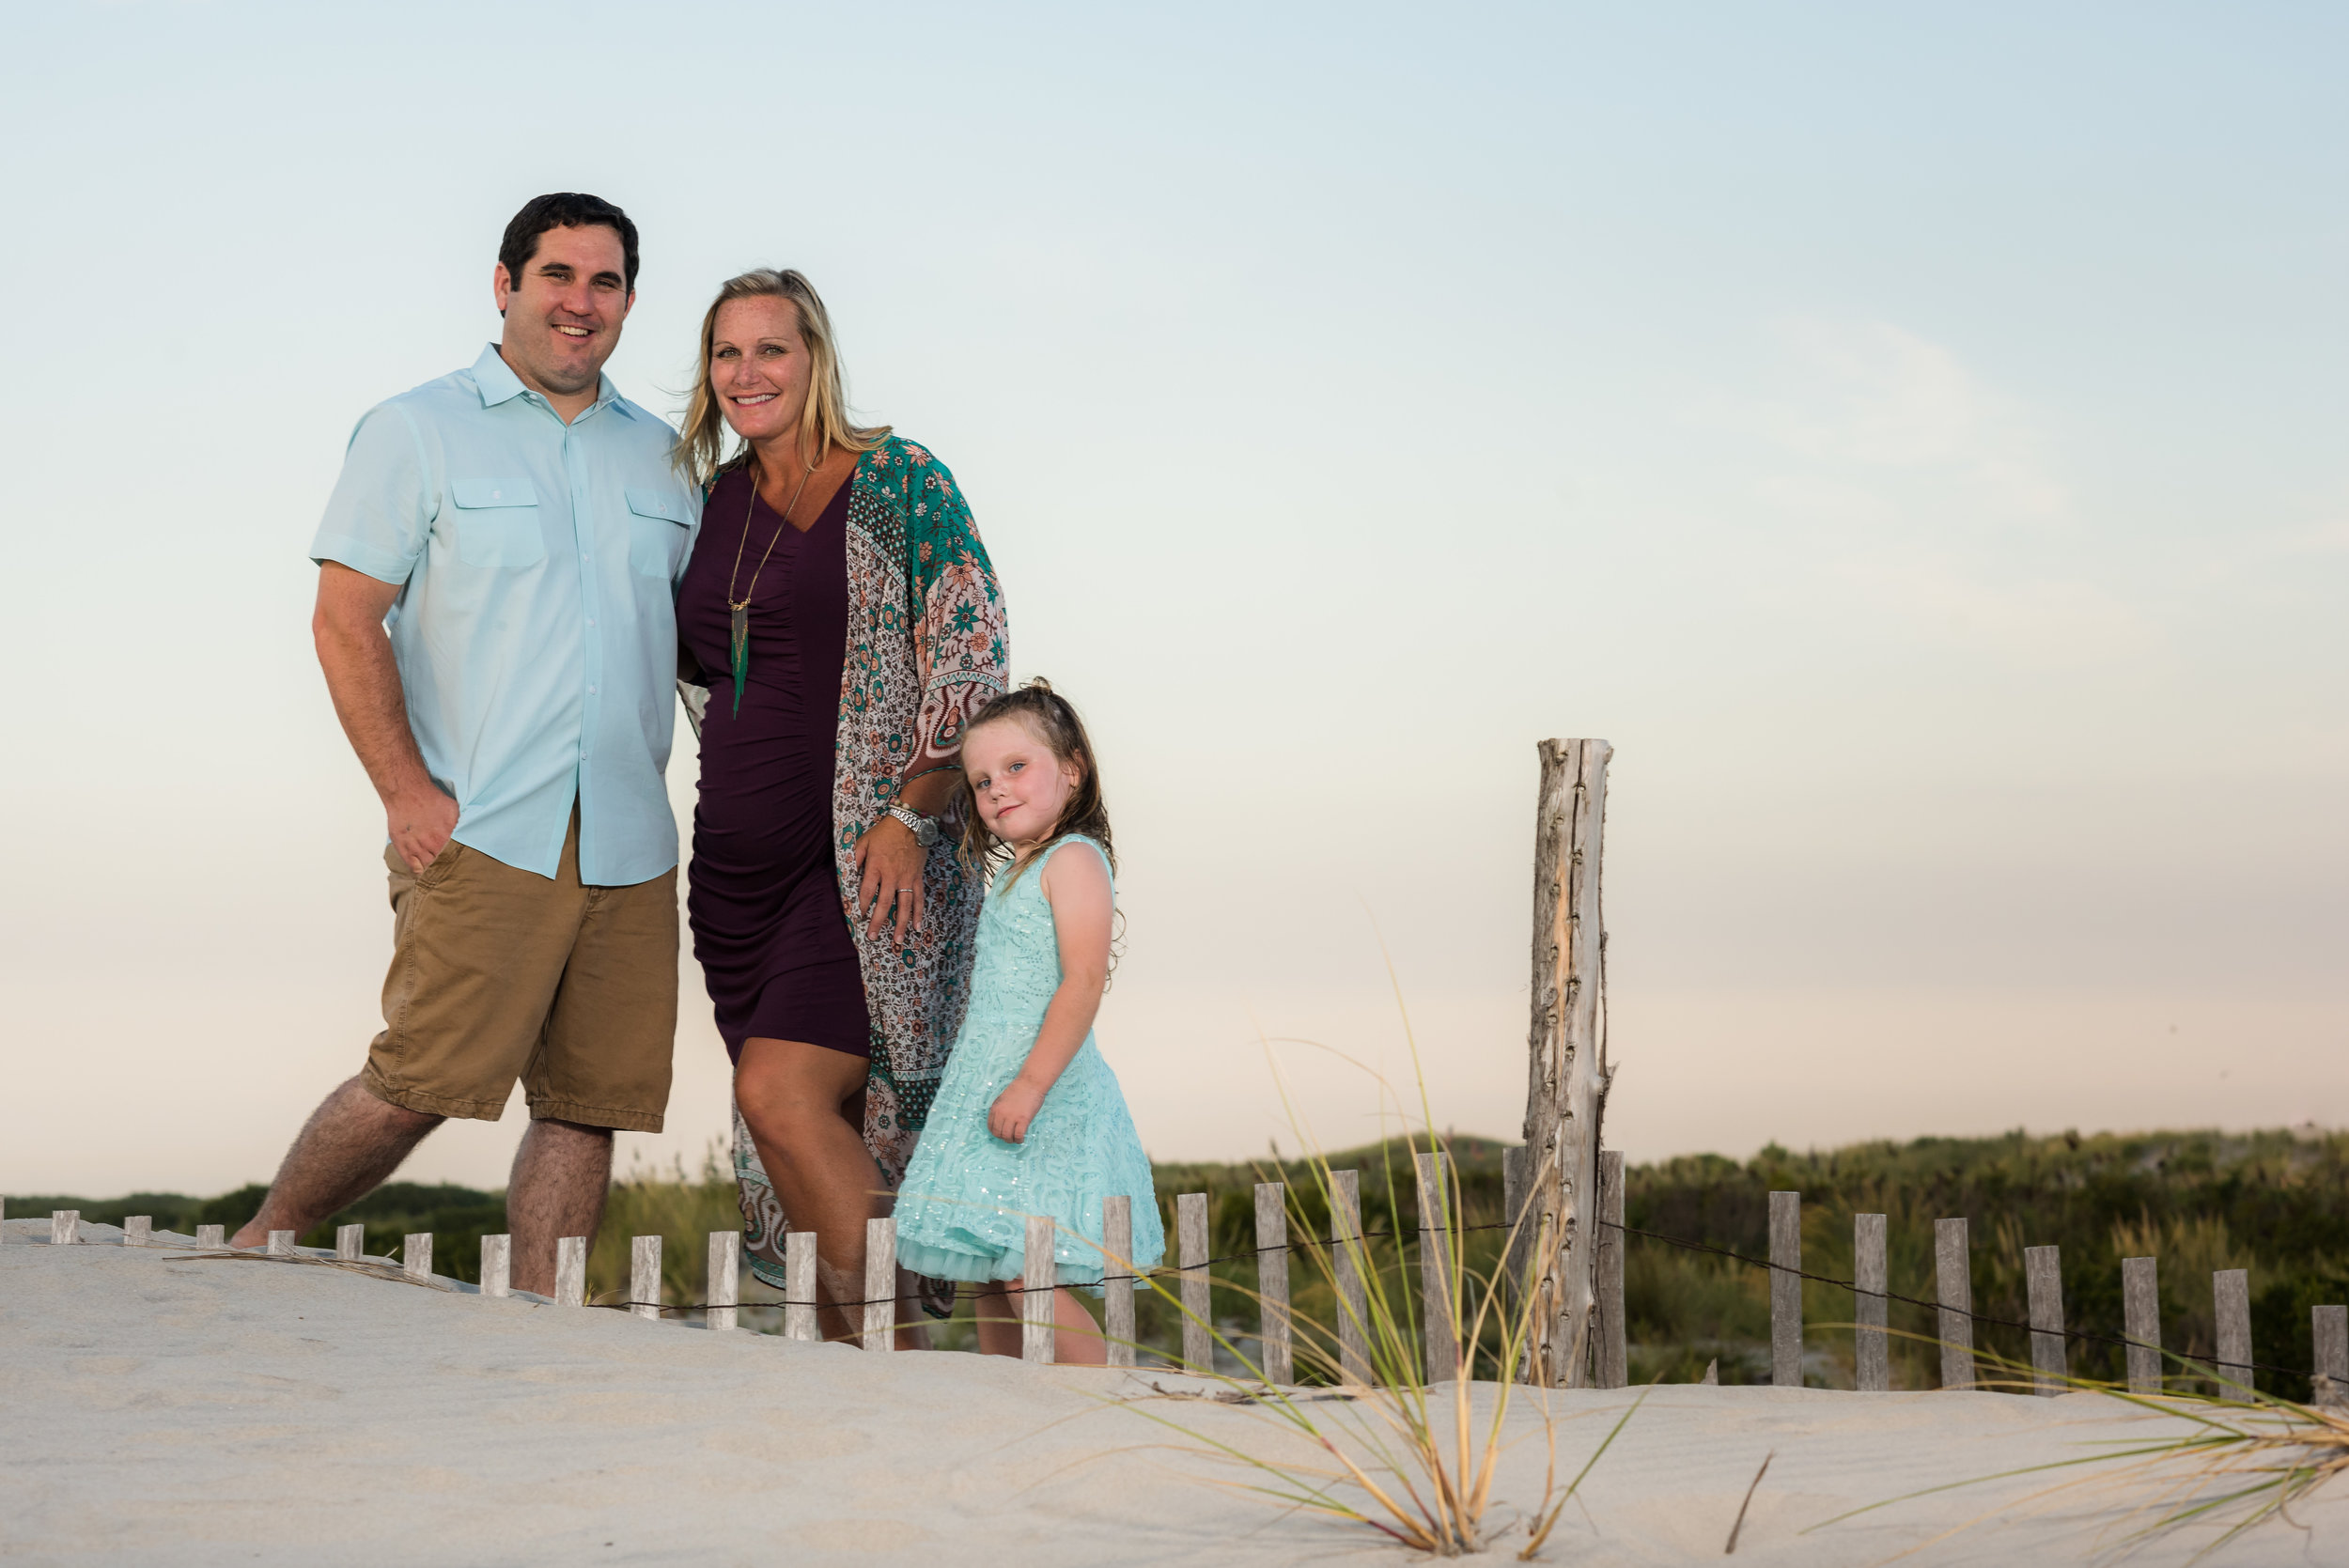 Long Beach Island Family Portraits, The Mayeuxs 7